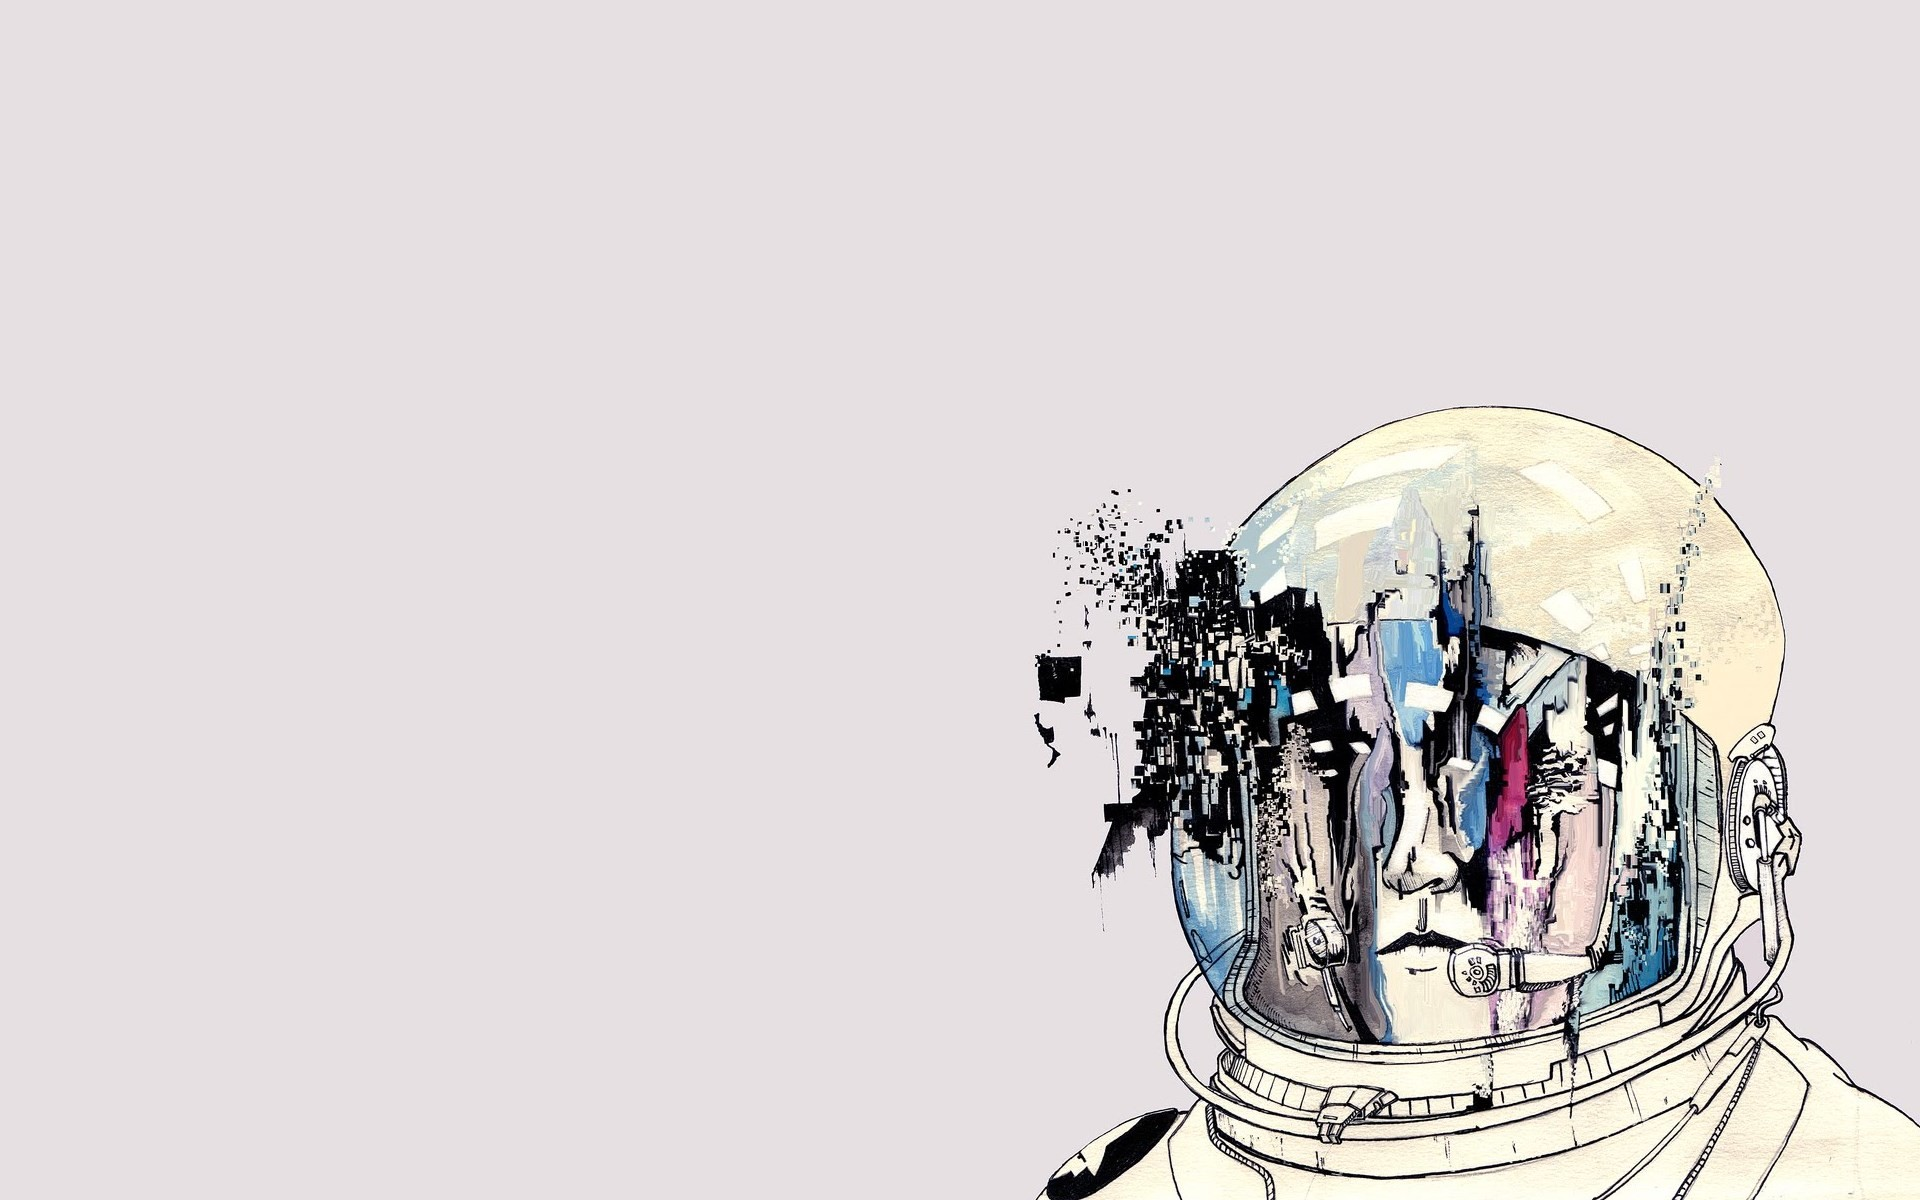 free desktop wallpaper downloads astronaut – astronaut category